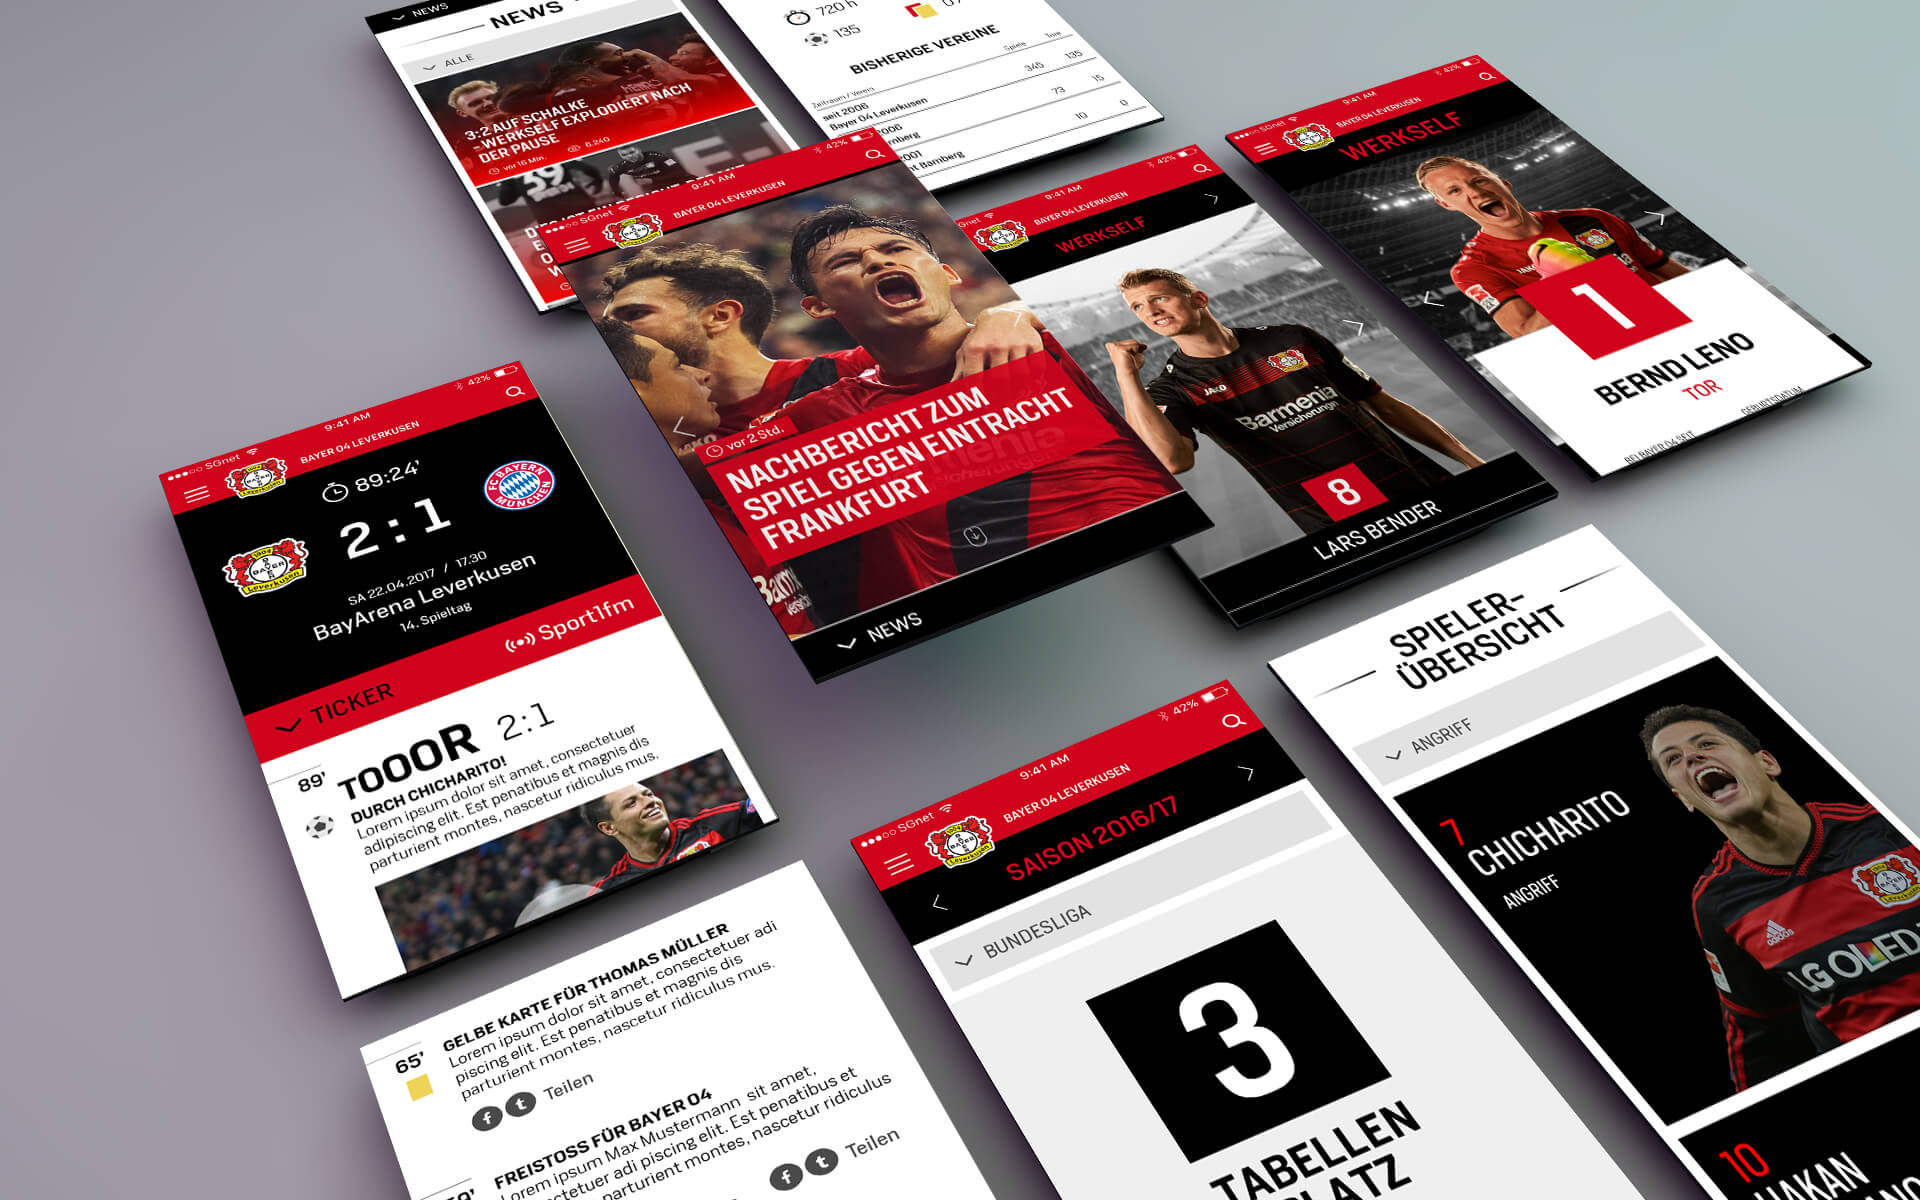 Bayer 04 Leverkusen Website, Relaunch, Redesign, Webdesign, UX, UI, mobile Screen views